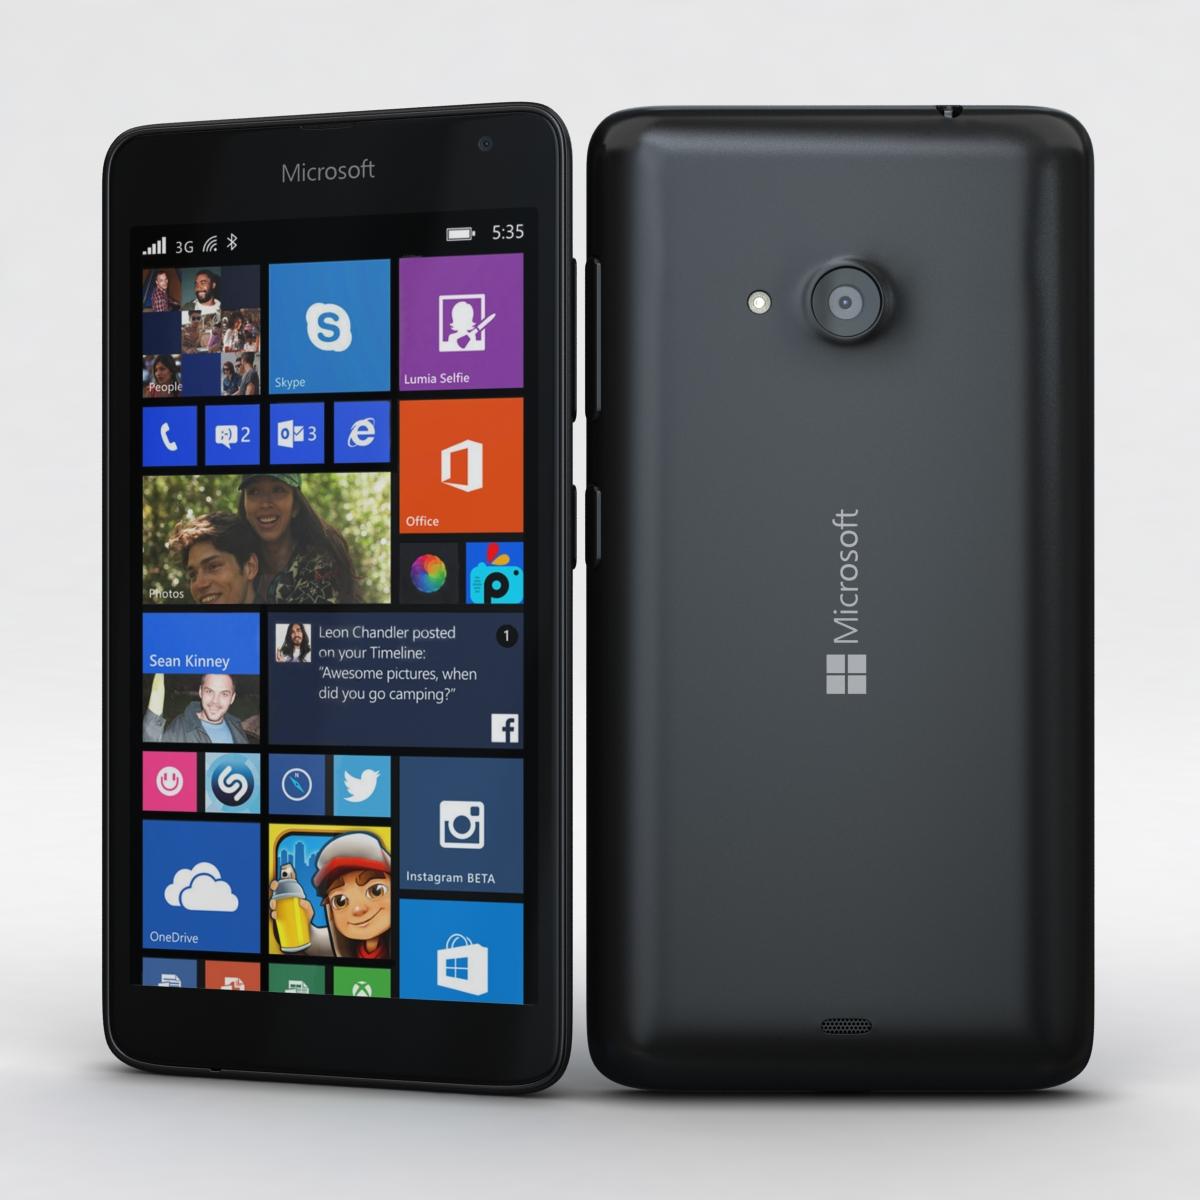 Microsoft Lumia 535 and Dual SIM Black 3d model 3ds max fbx c4d obj 204349